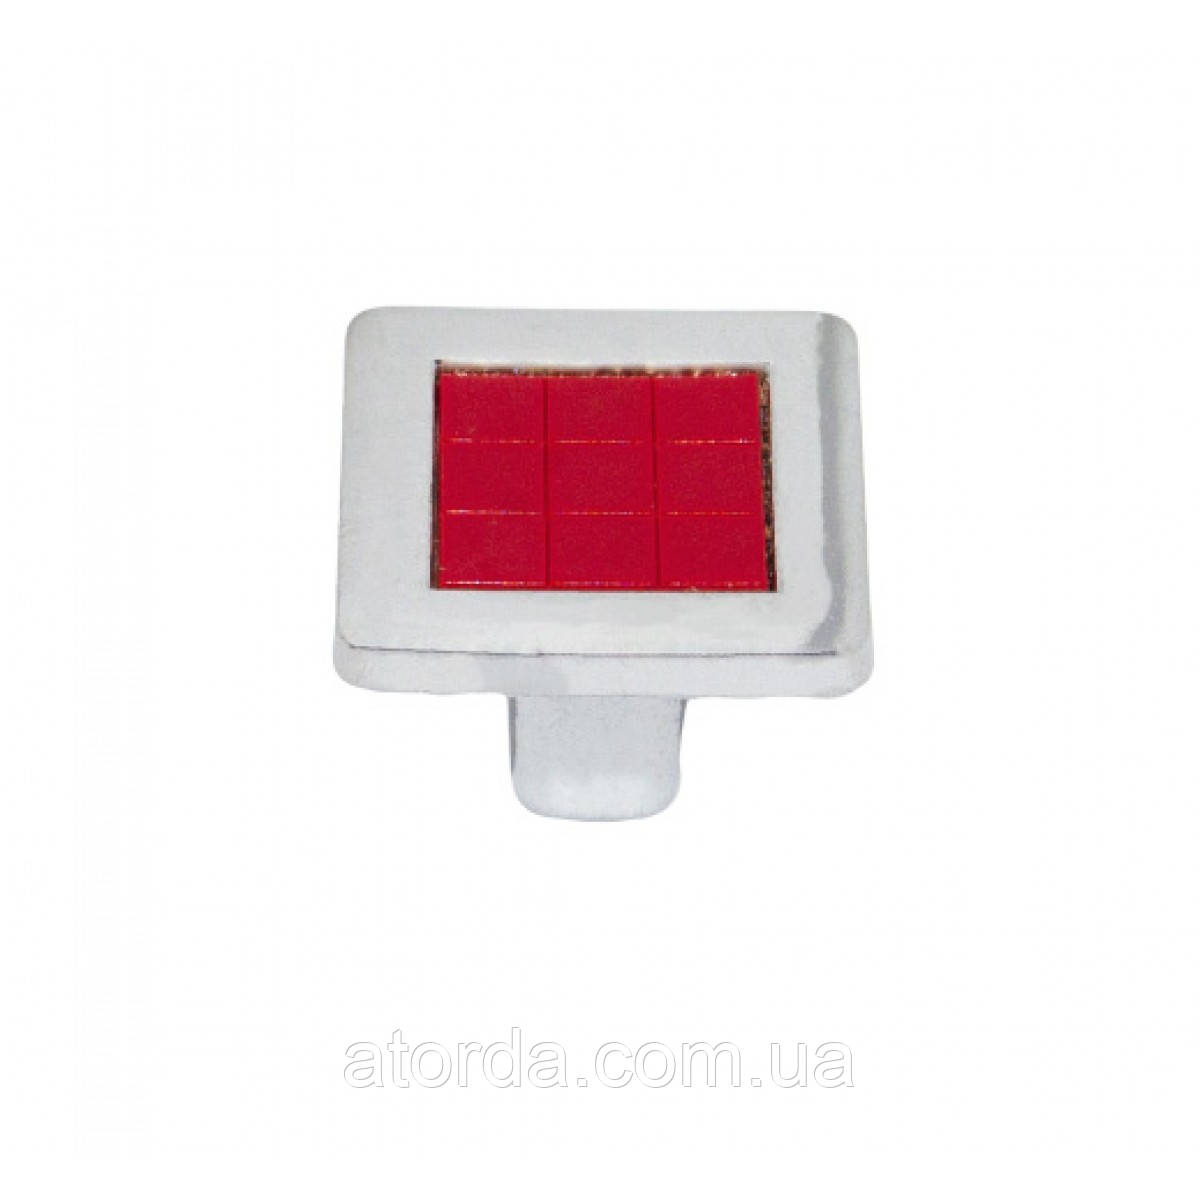 Ручка меблева Ozkardesler 6064-06/038 MADRID DUGME Хром-Червоний